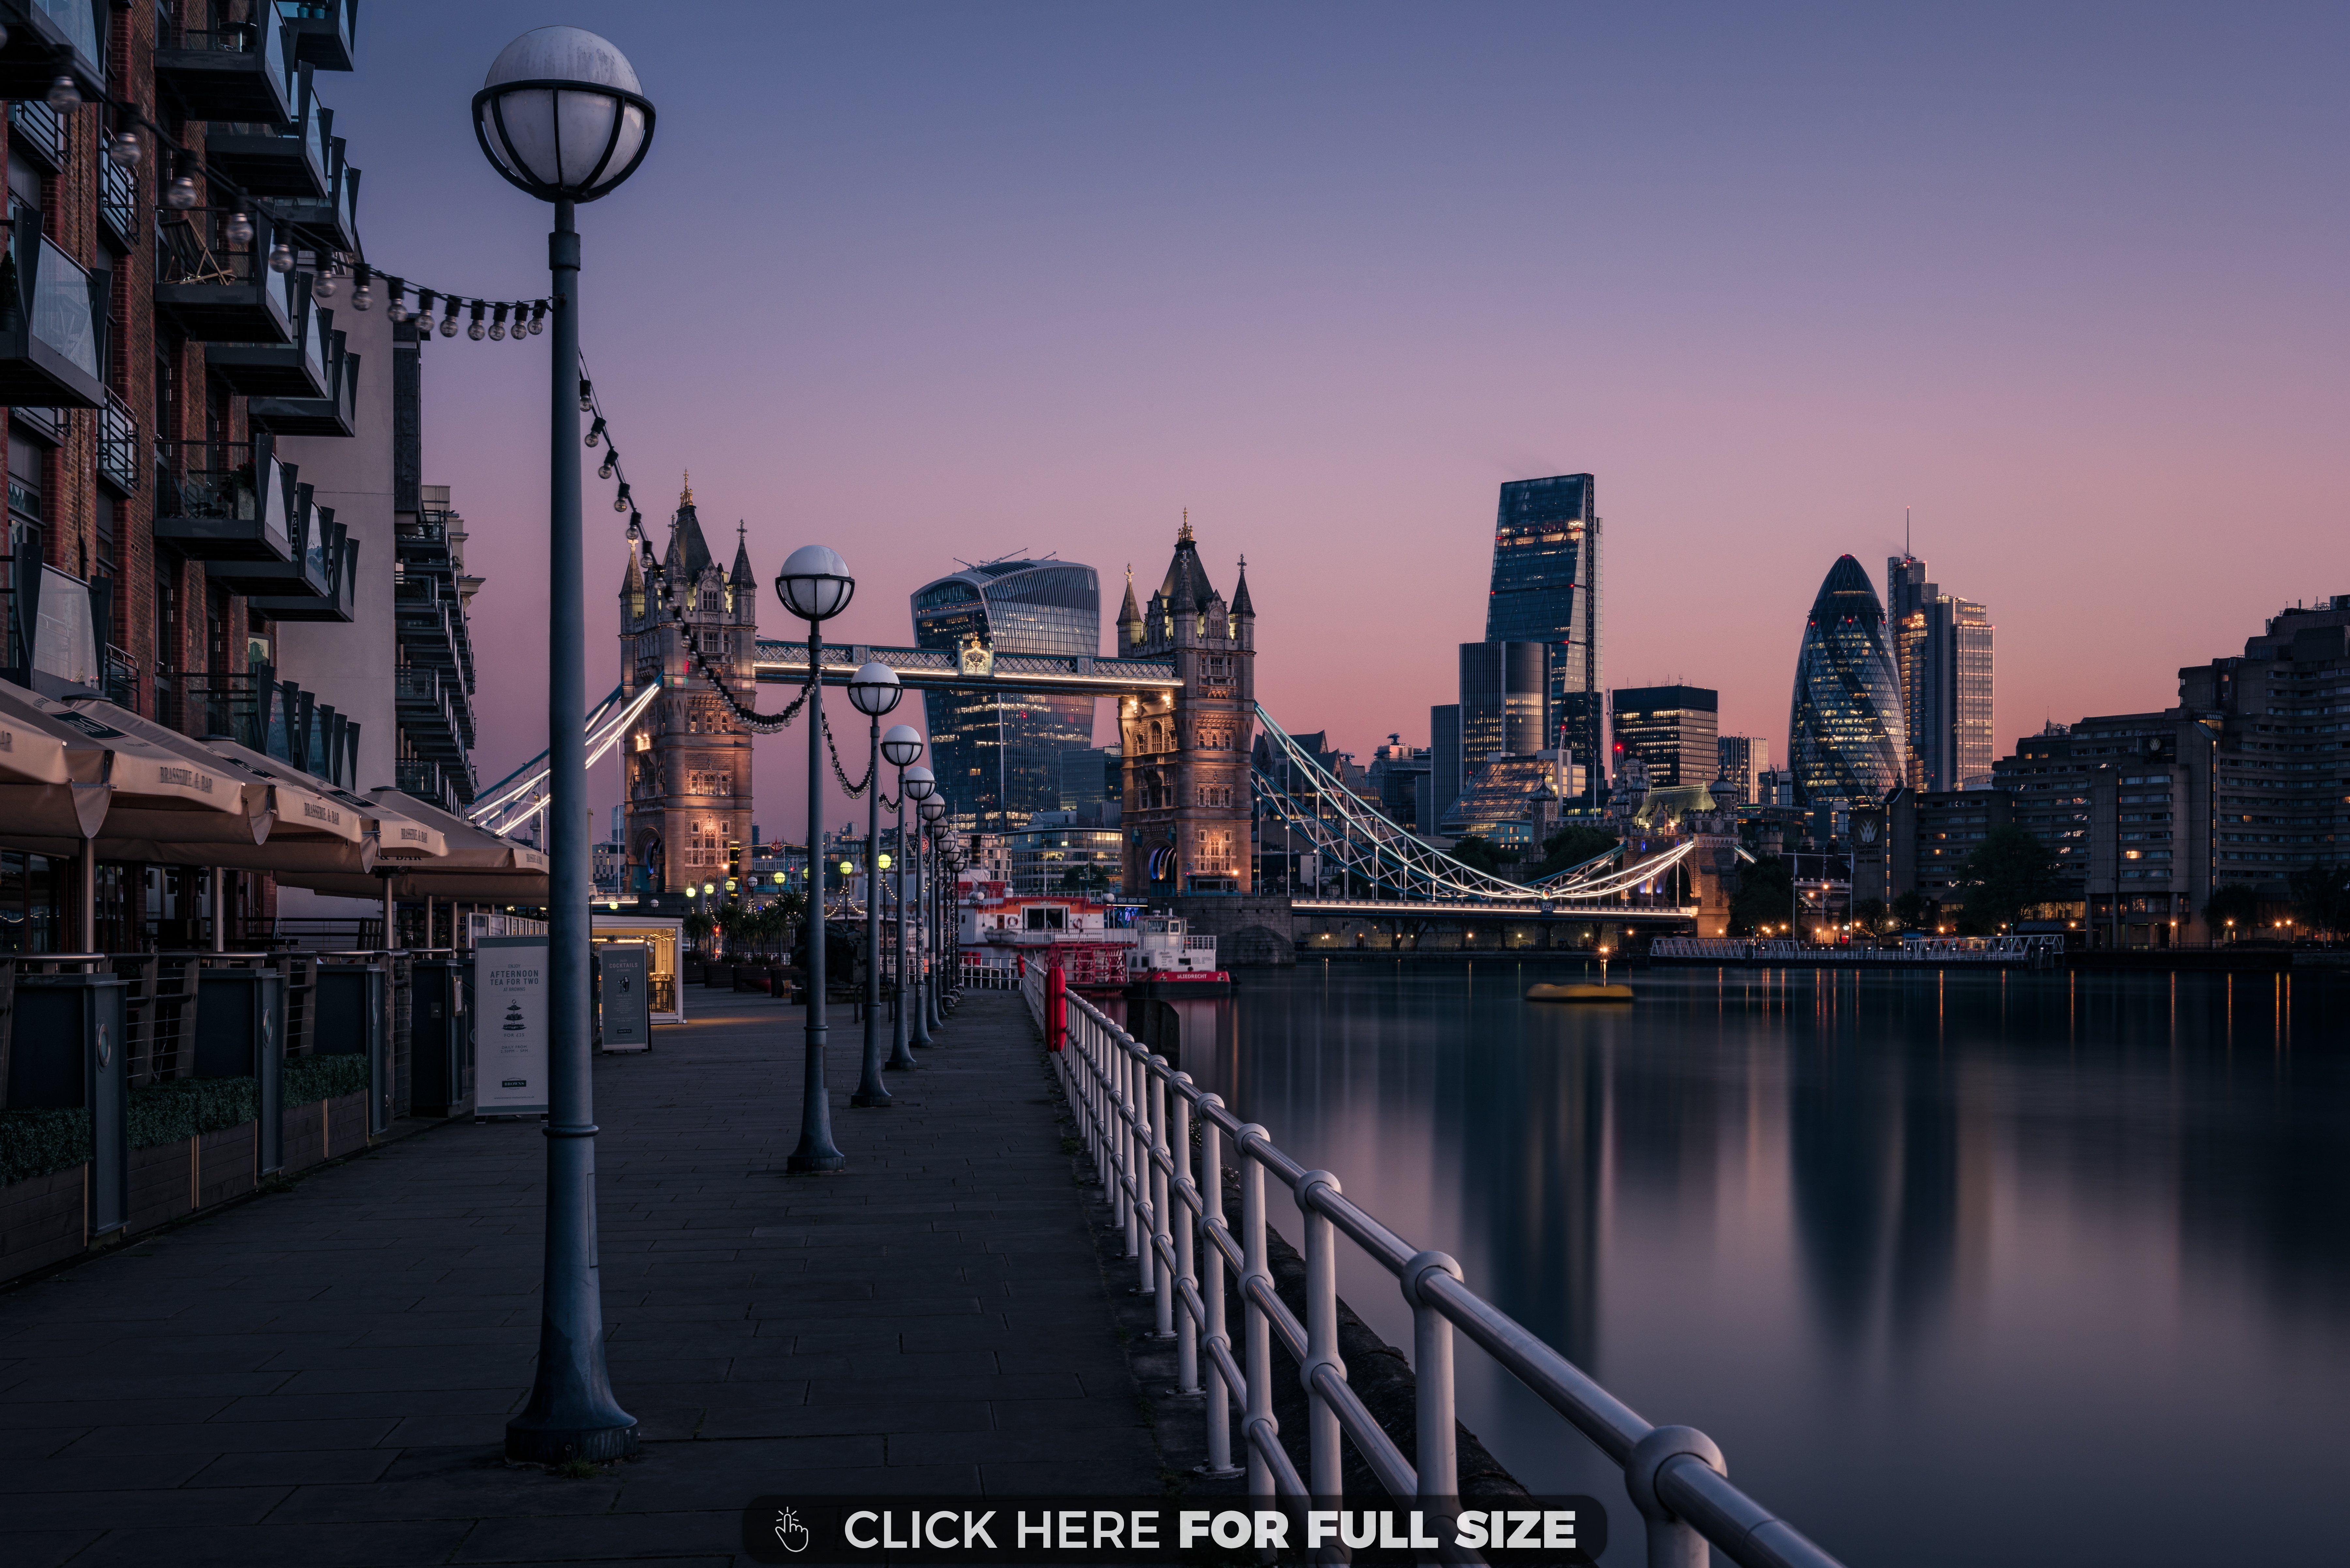 4k London Wallpapers Top Free 4k London Backgrounds